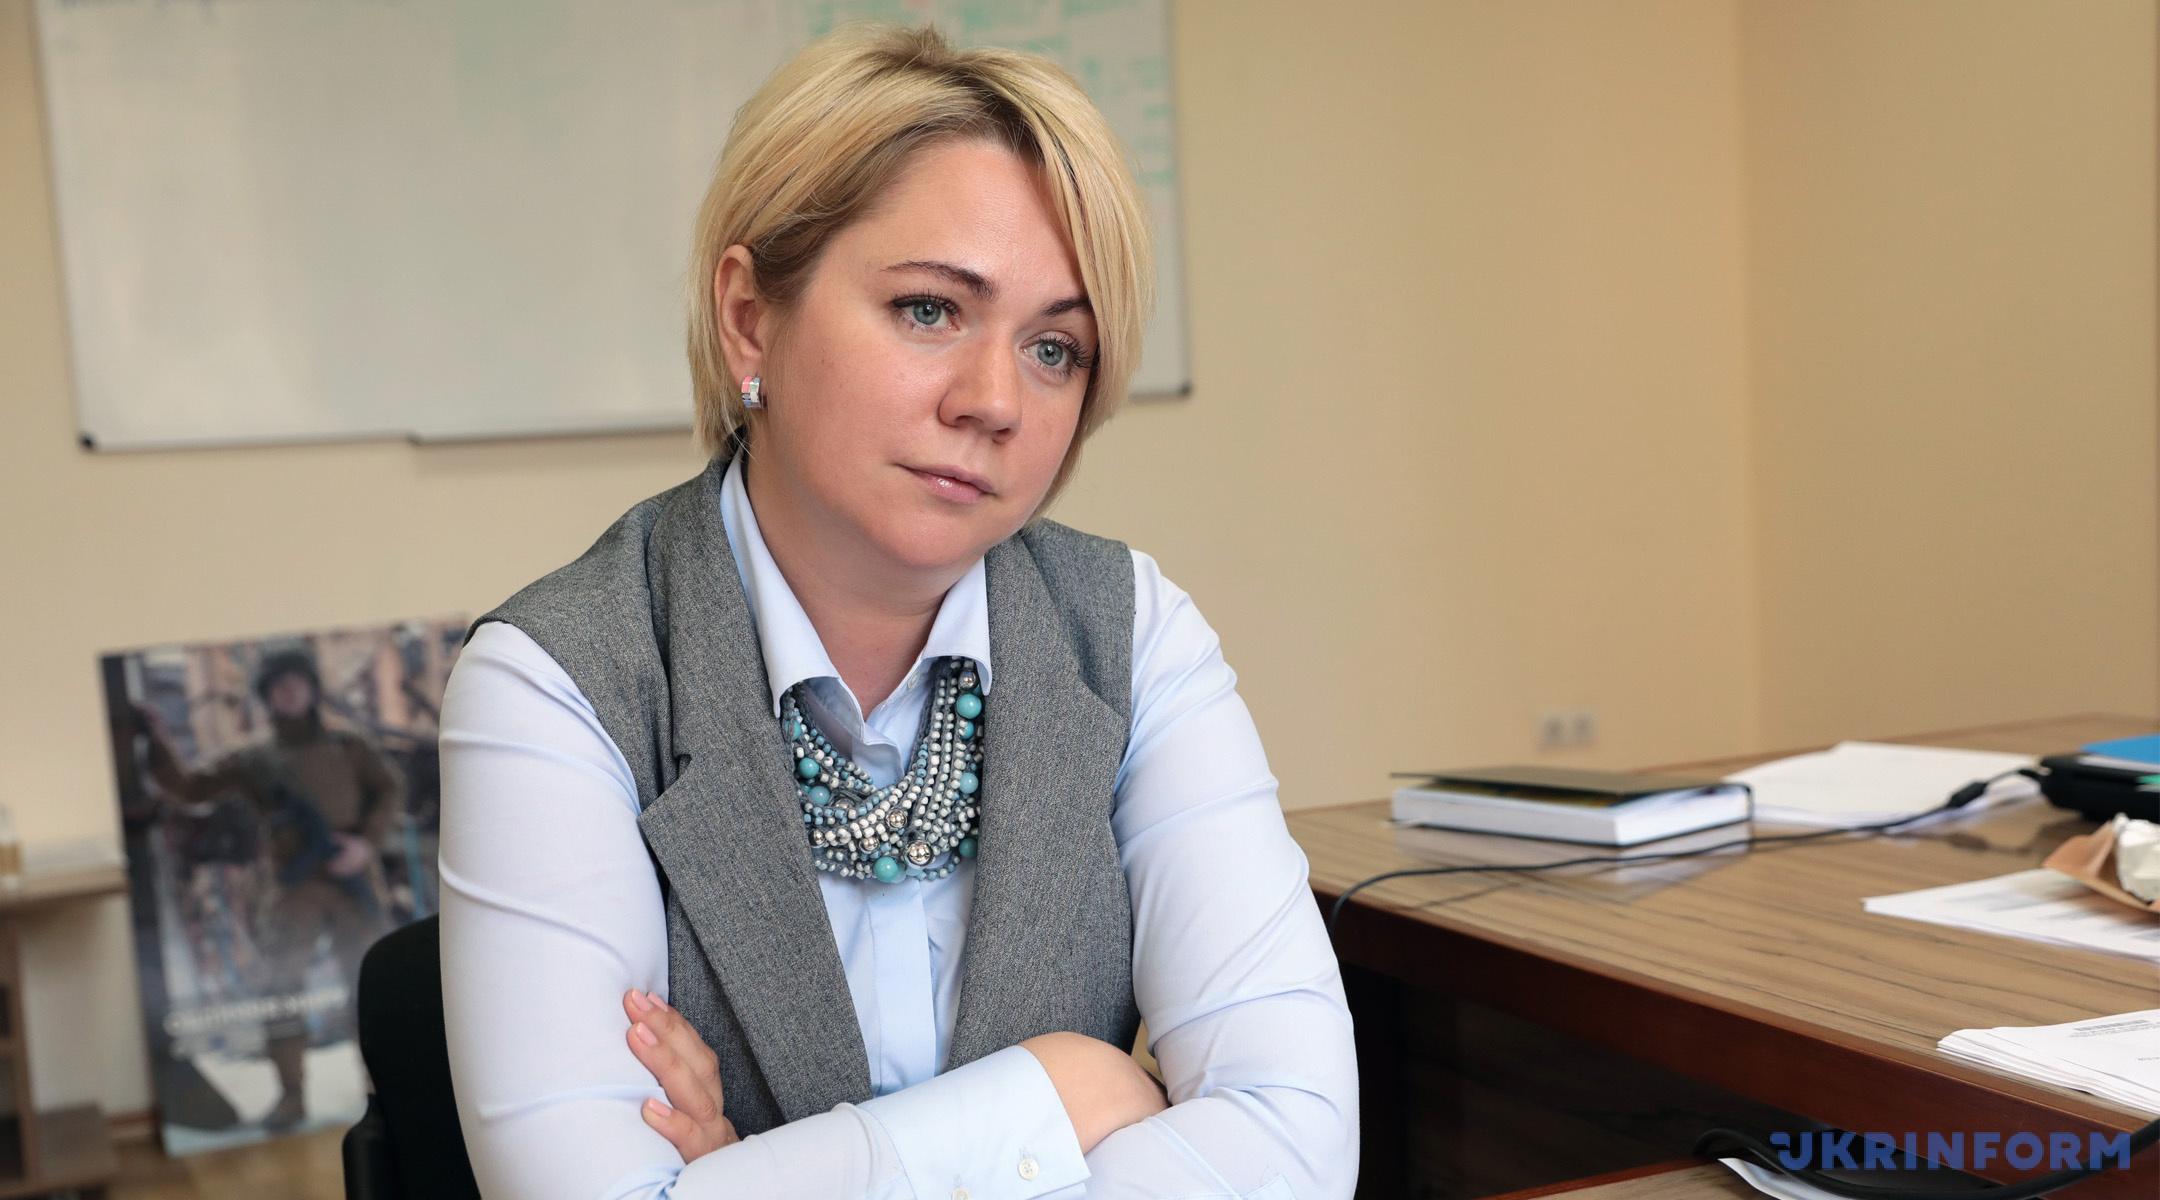 https://static.ukrinform.com/photos/2019_05/1559318171-977.jpg?0.7068706742290112